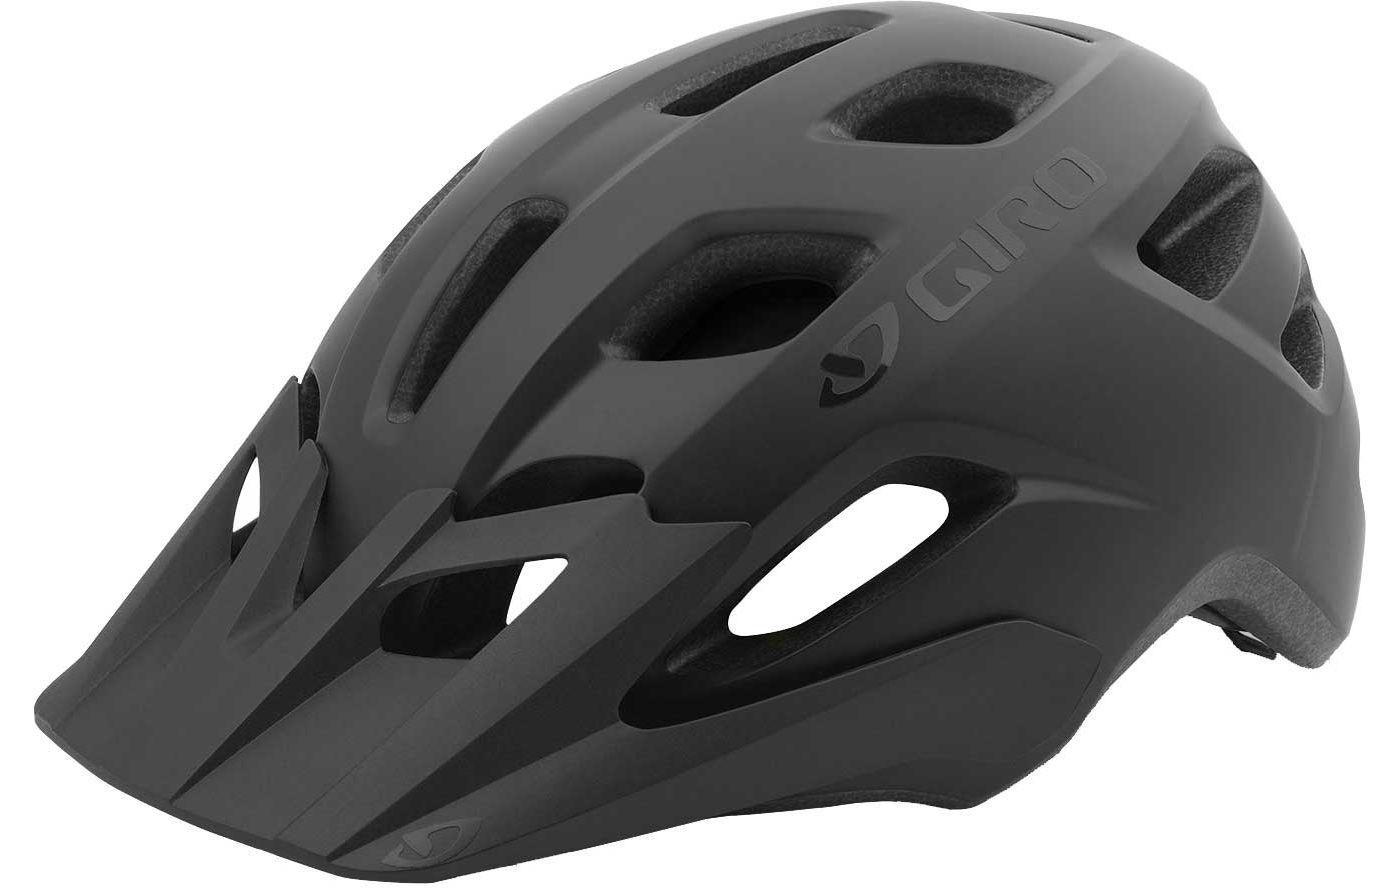 Giro Adult Compound MIPS Bike Helmet